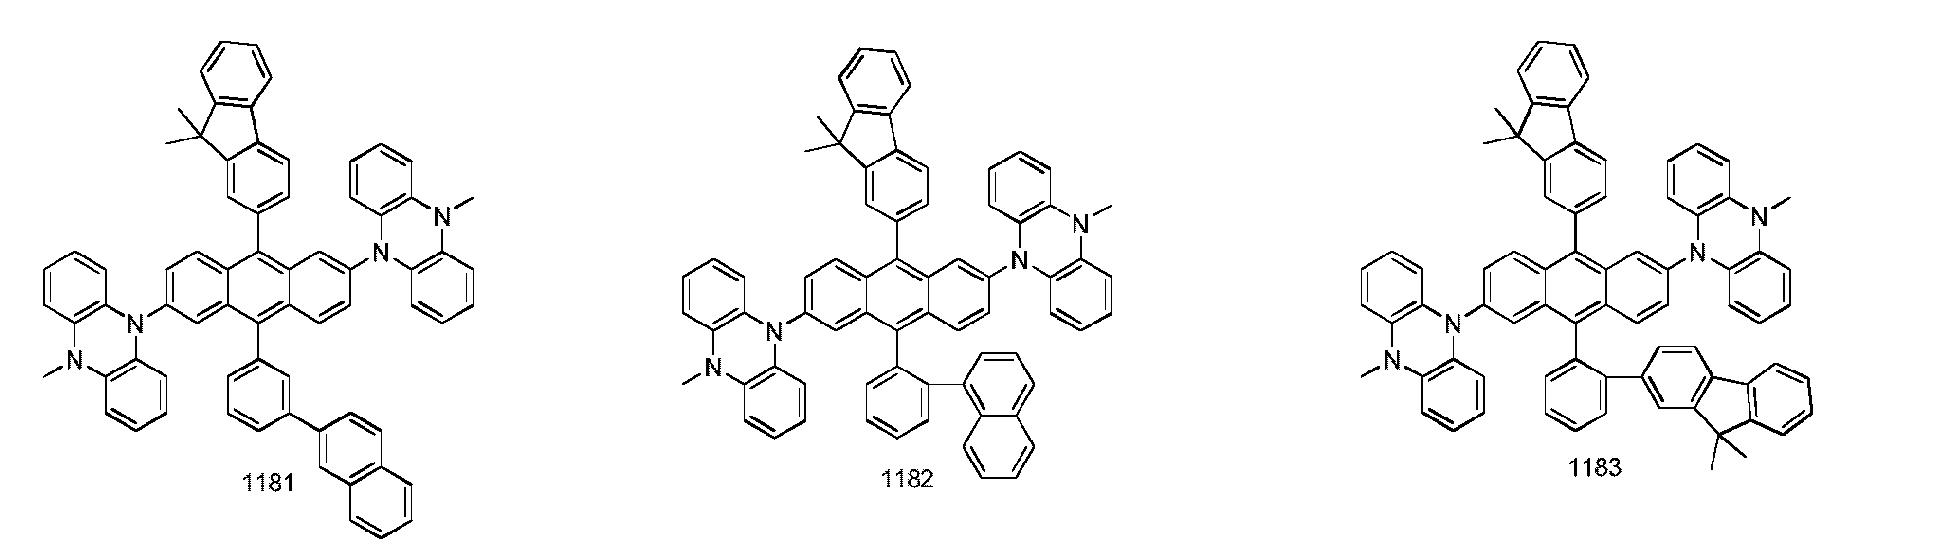 Figure imgb0192